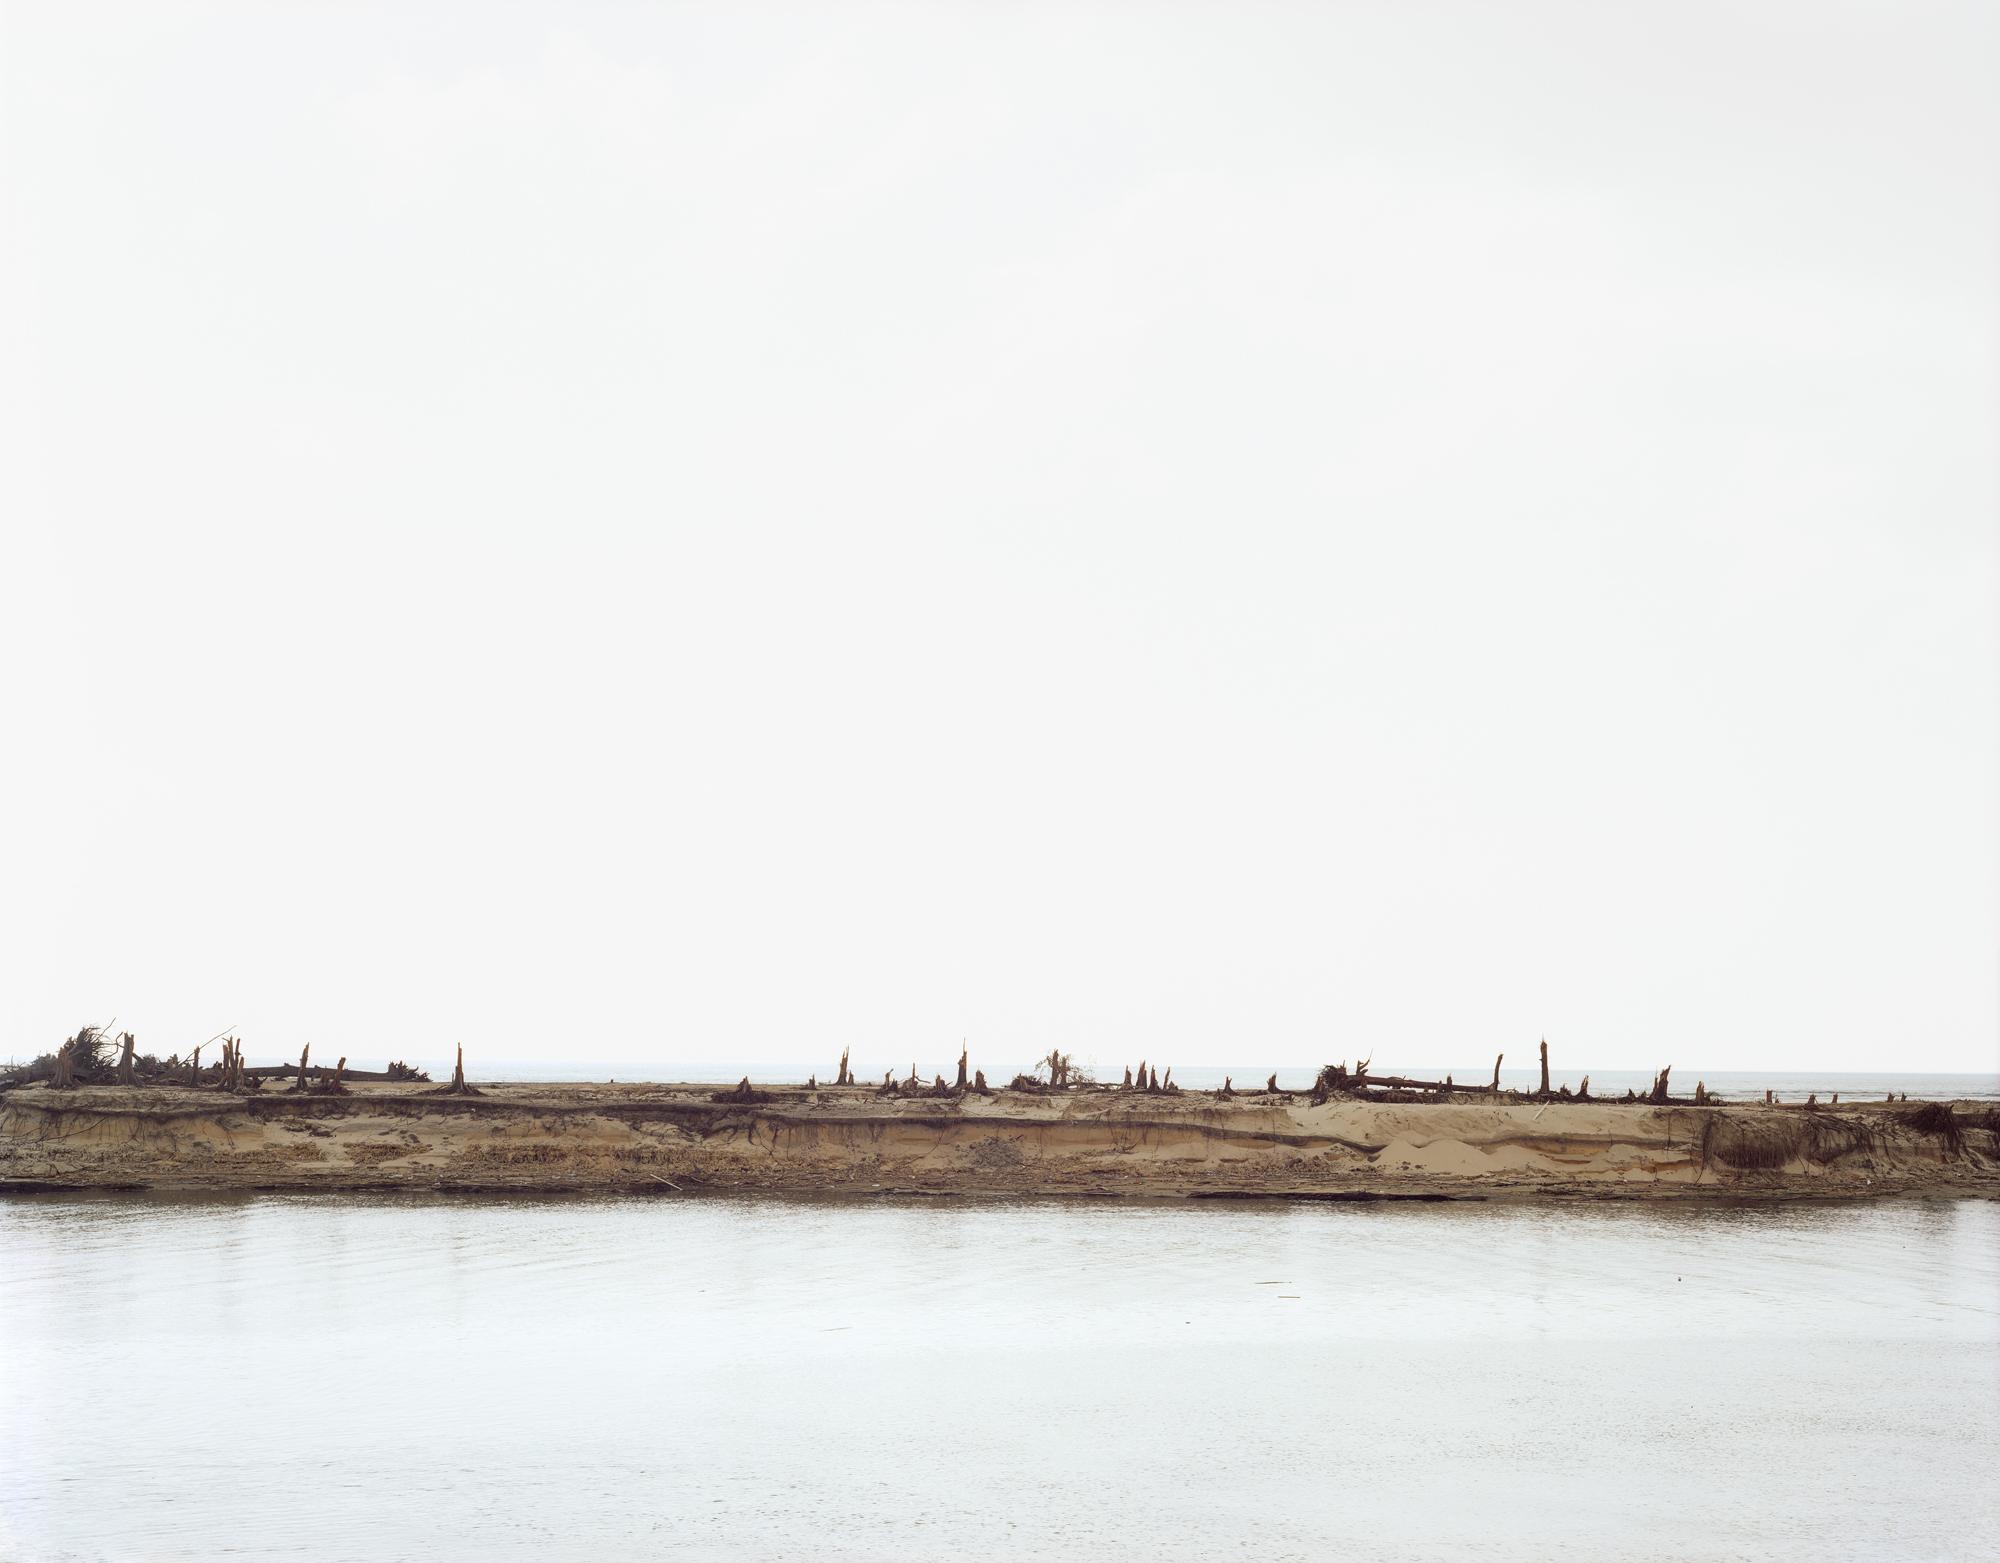 Sasha Bezzubov, Tsunami #2, Indonesia, 2005